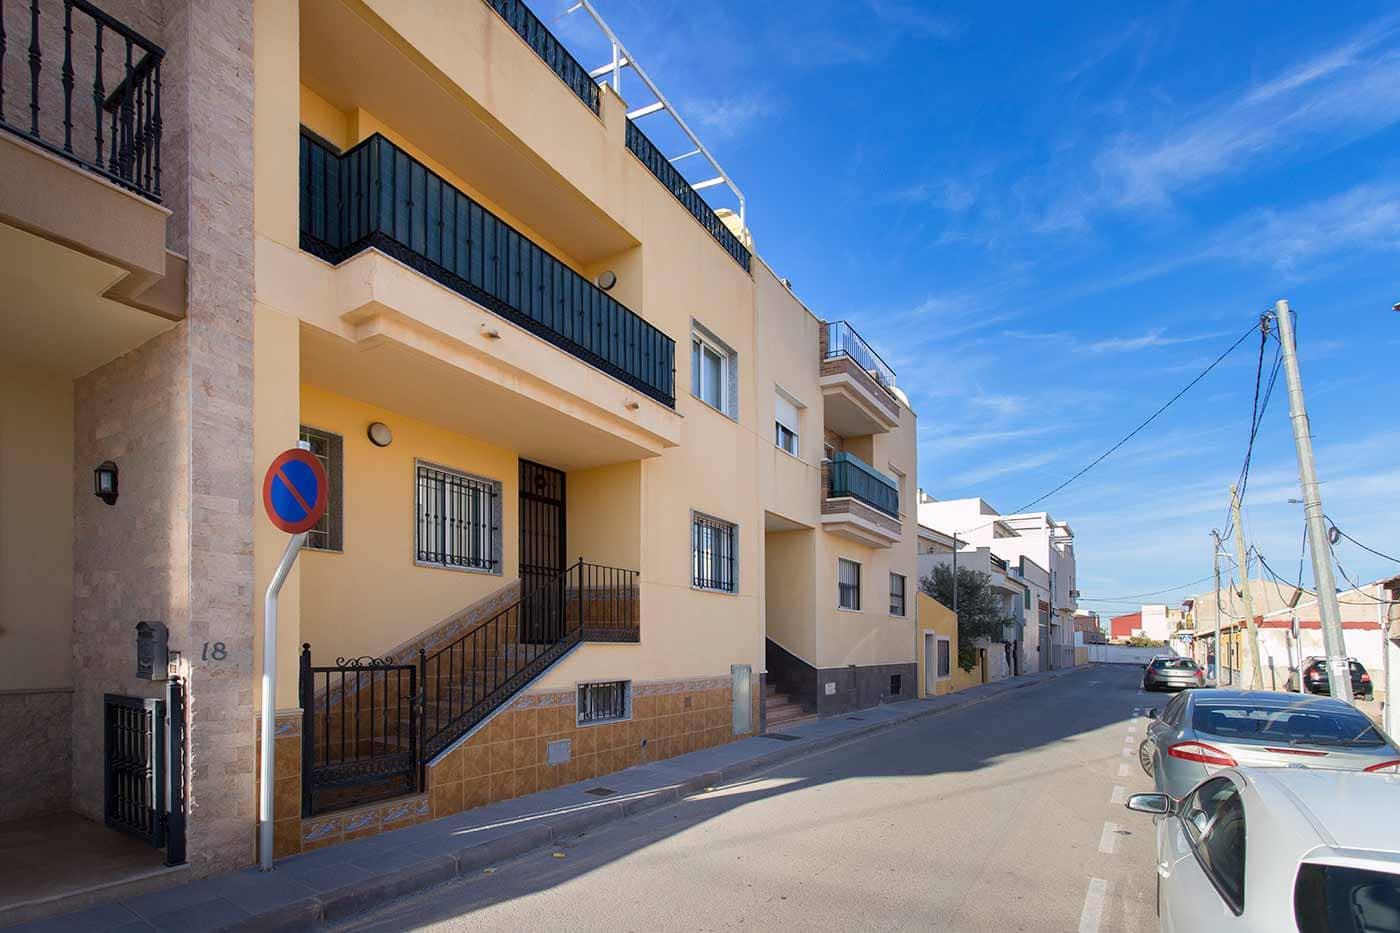 3 bedroom Apartment for sale in Pilar de la Horadada with garage - € 88,000 (Ref: 4414034)